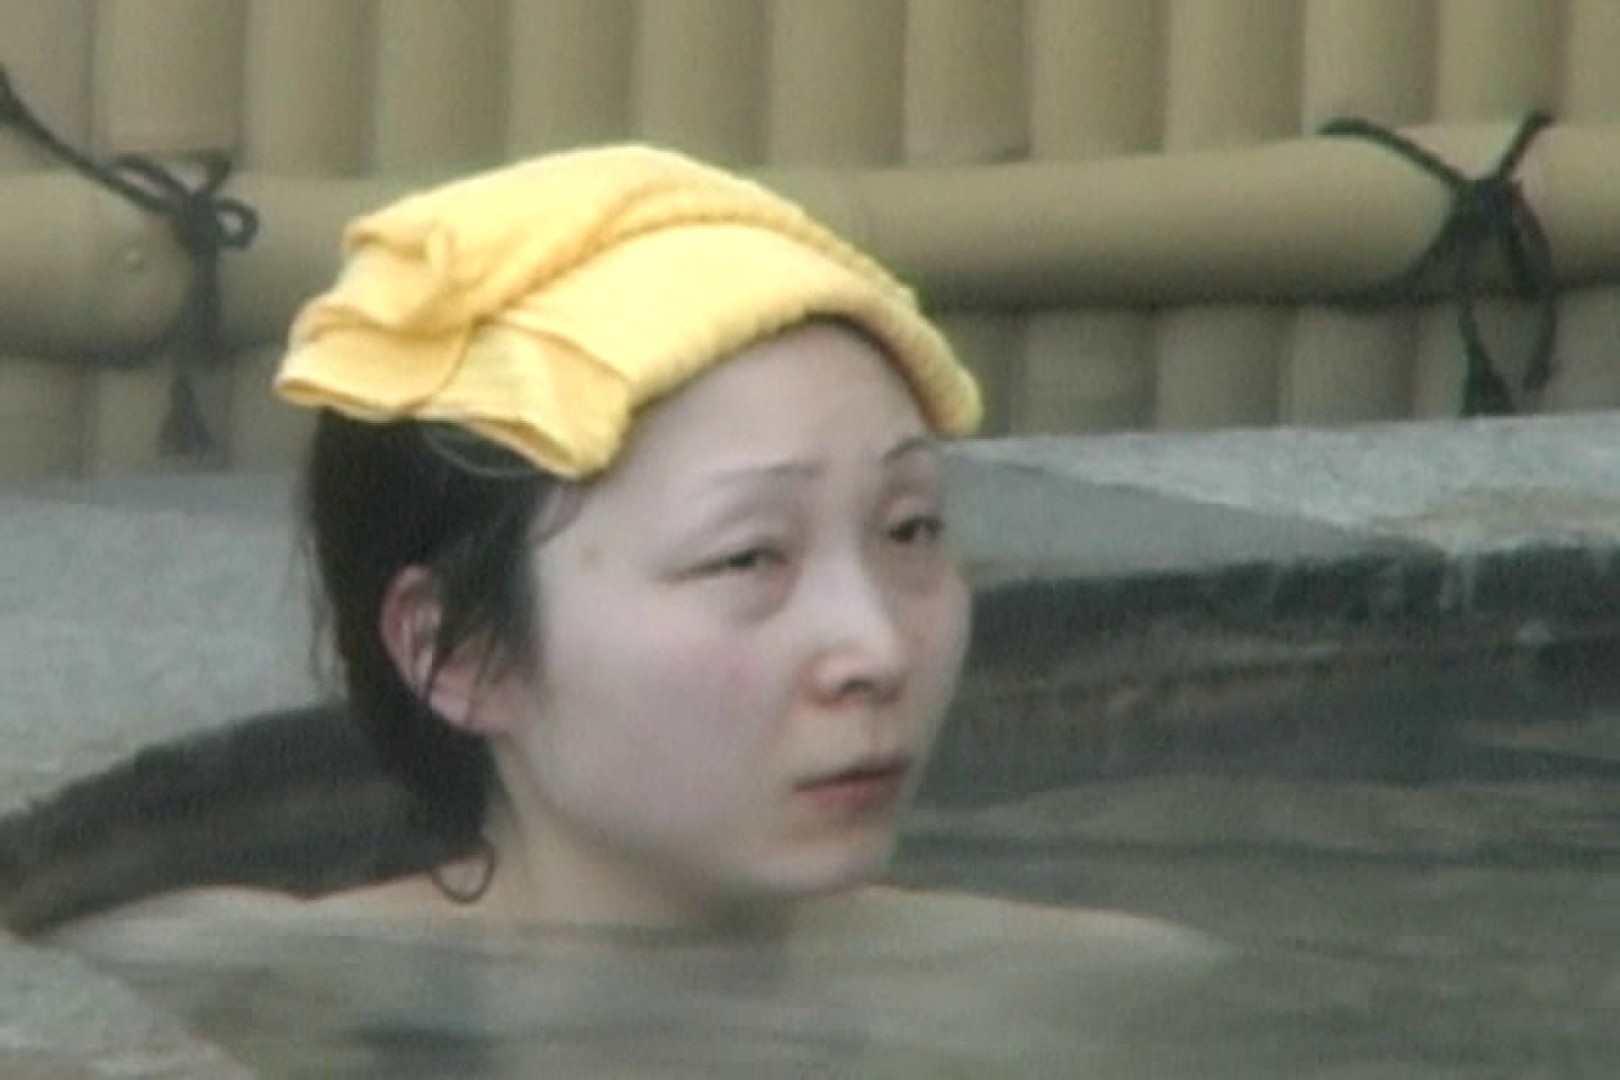 Aquaな露天風呂Vol.596 OLセックス | 盗撮  77画像 37